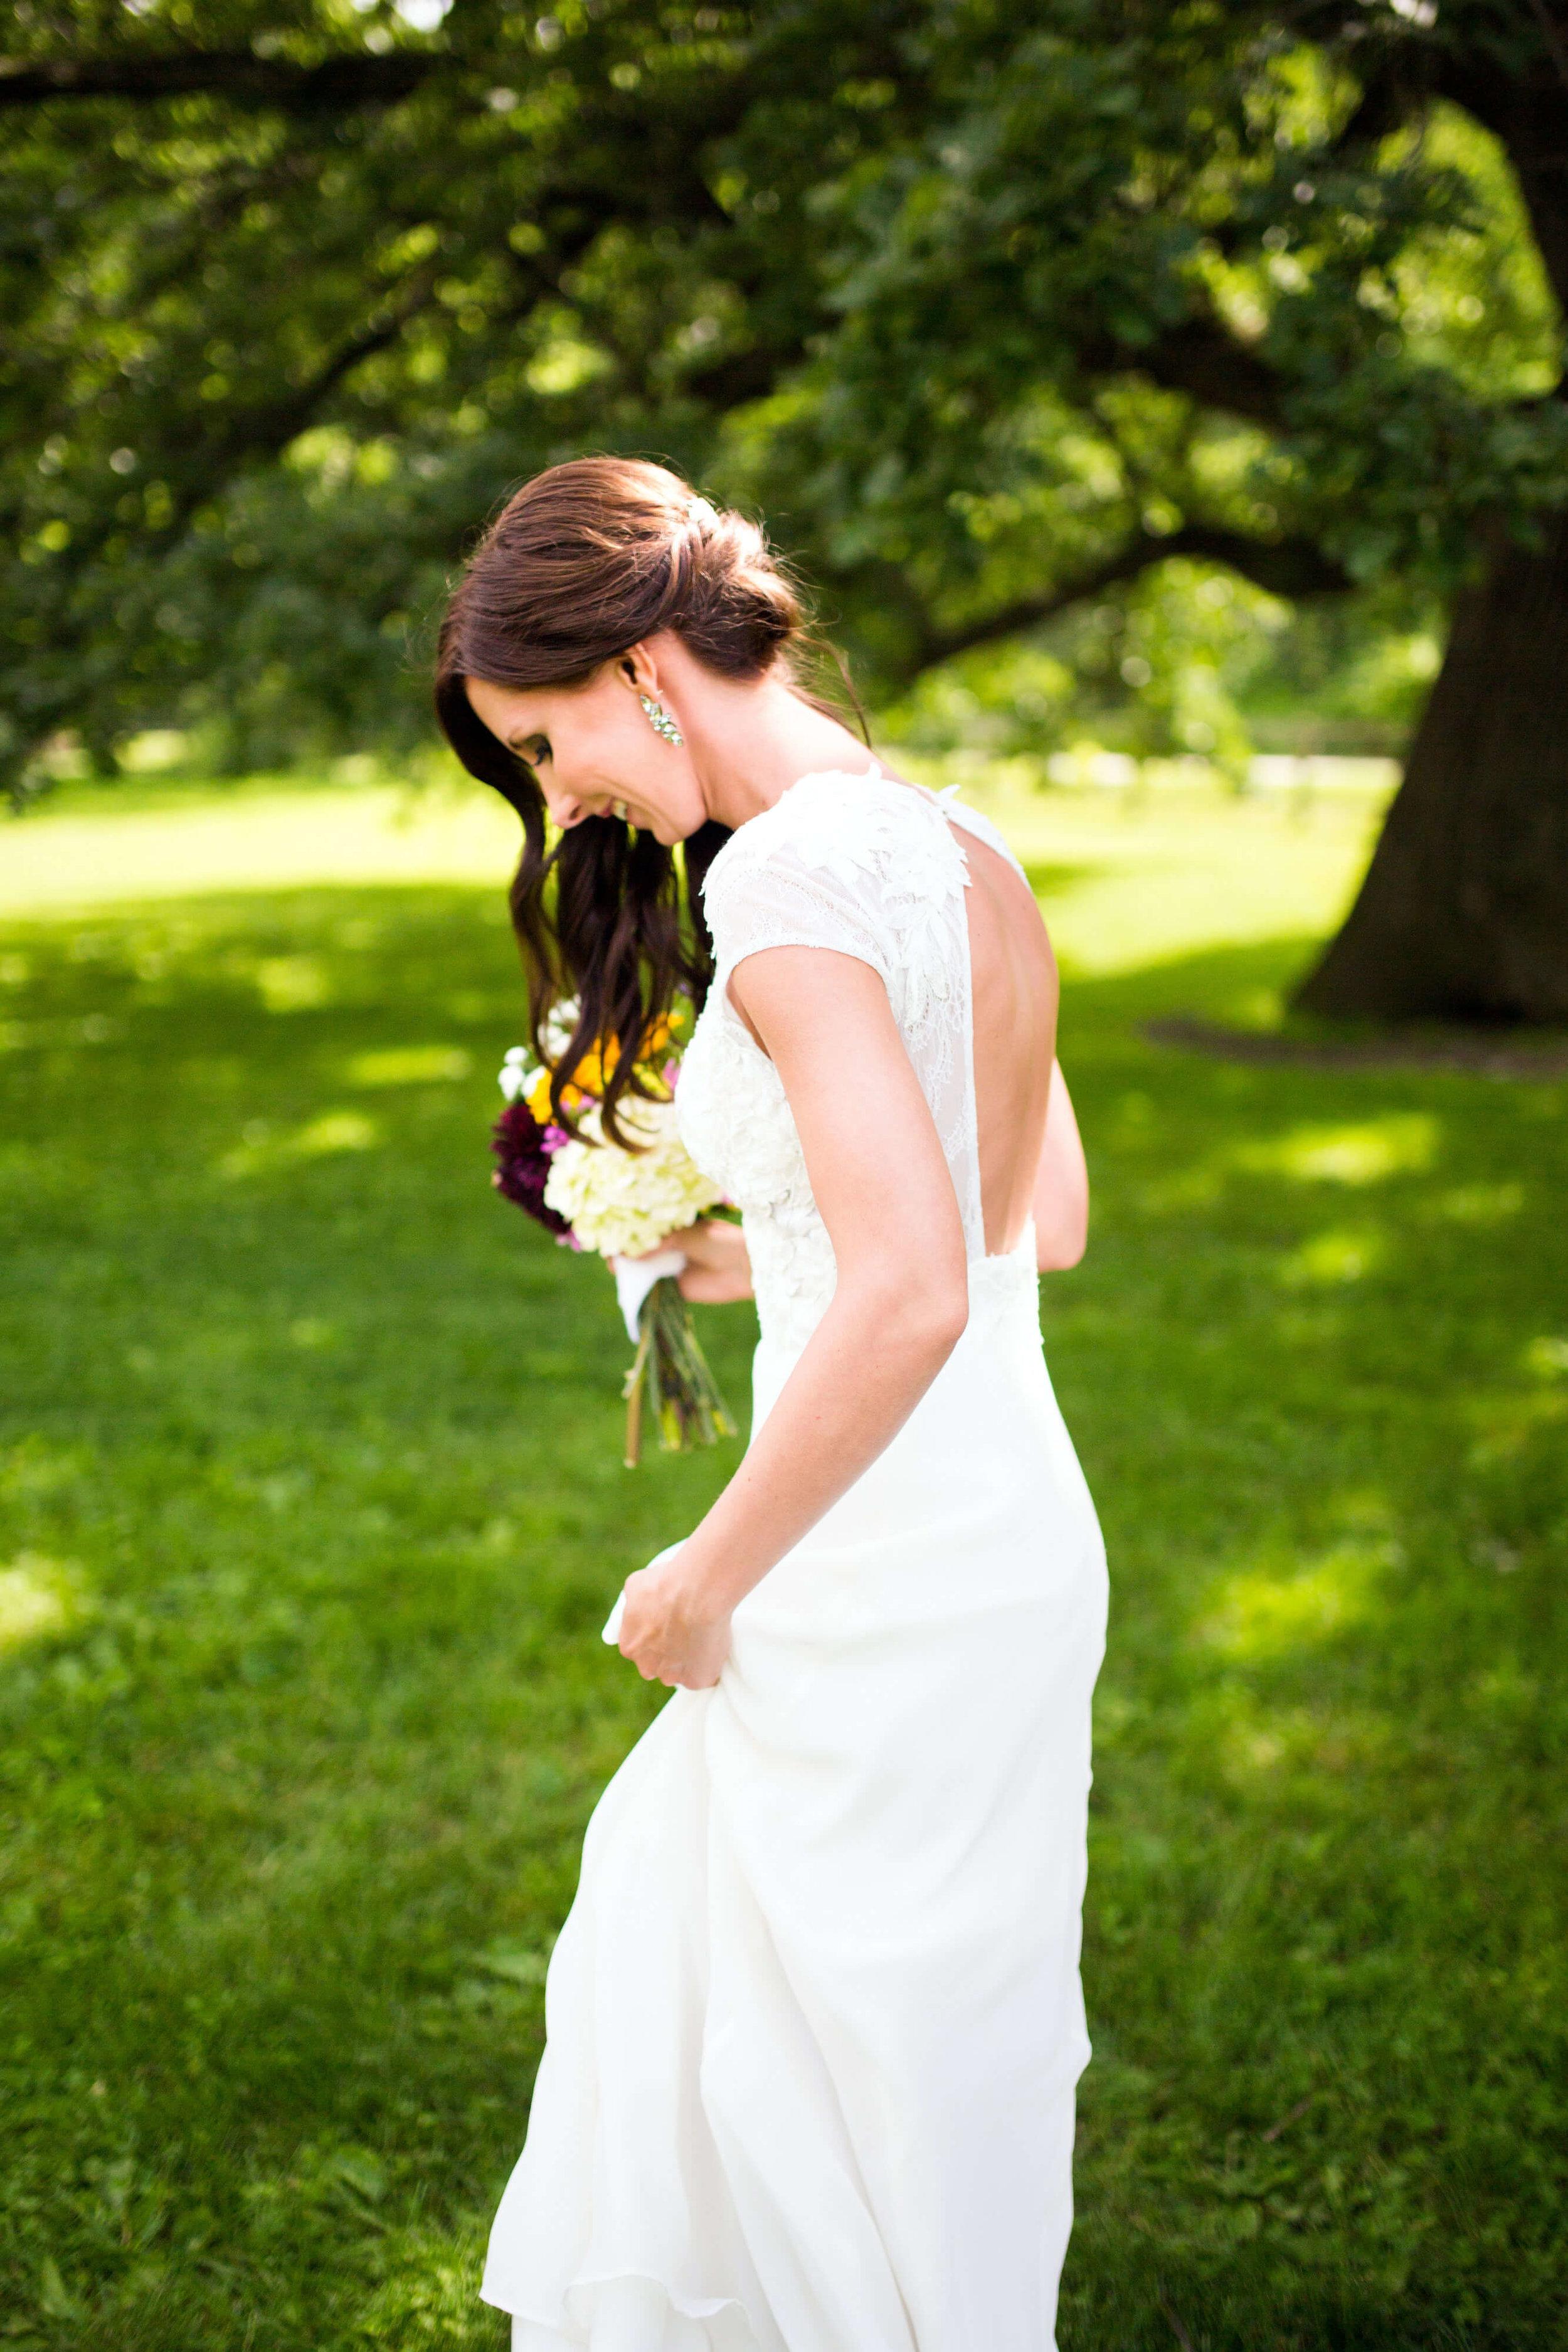 Studio KH | key hole wedding dress back | 70 ways to capture your wedding dress details